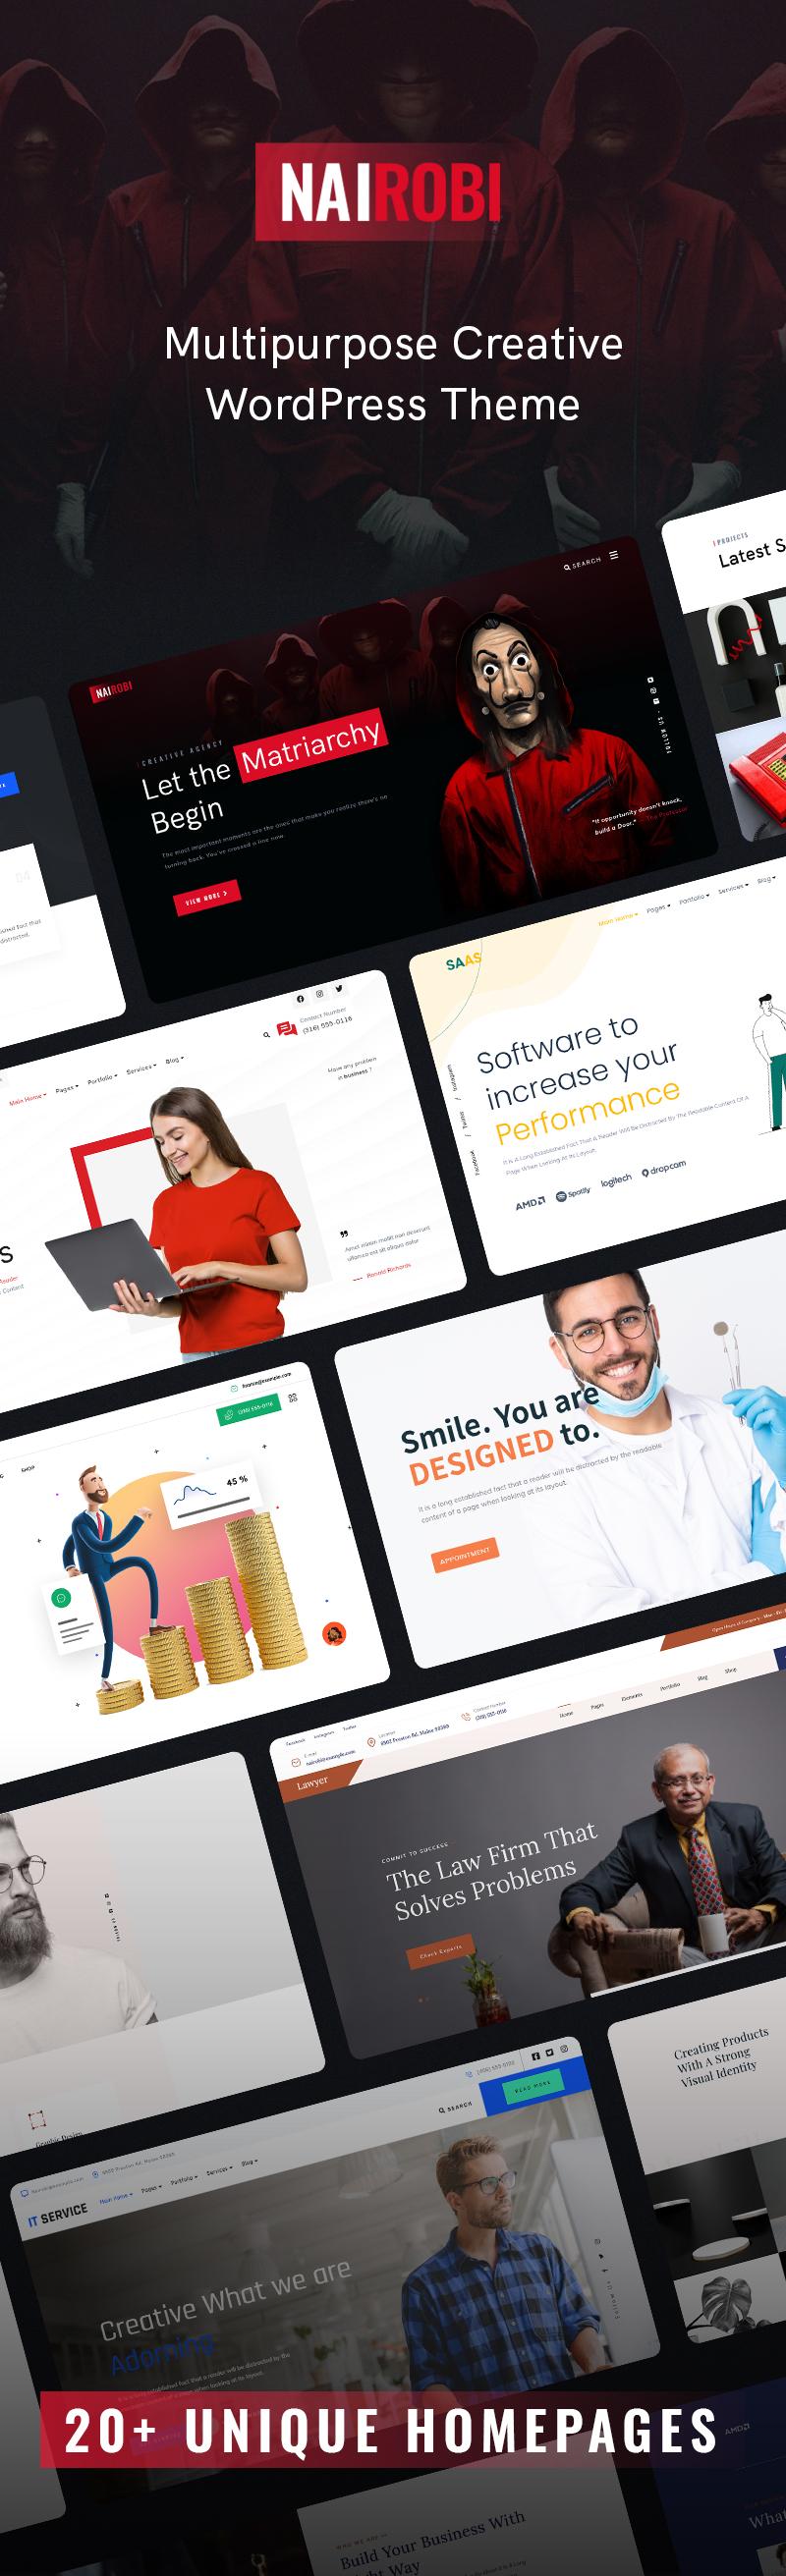 Creative Business WordPress Theme | Nairobi | Iqonic Design